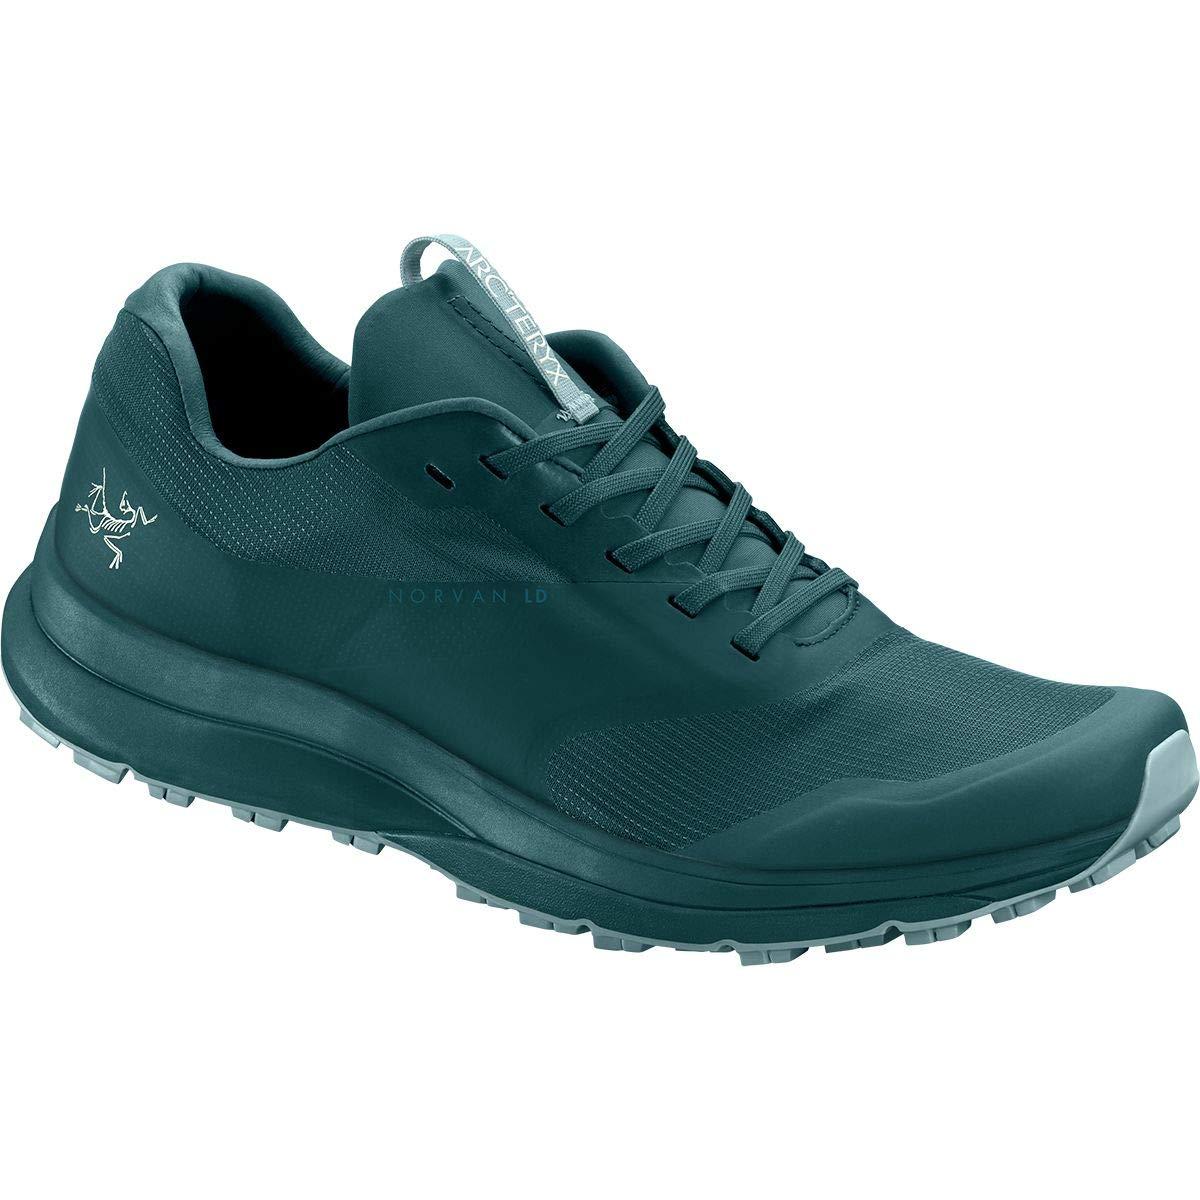 Labyrinth Robotica Arc'teryx Norvan LD Trail Running shoes - Men's